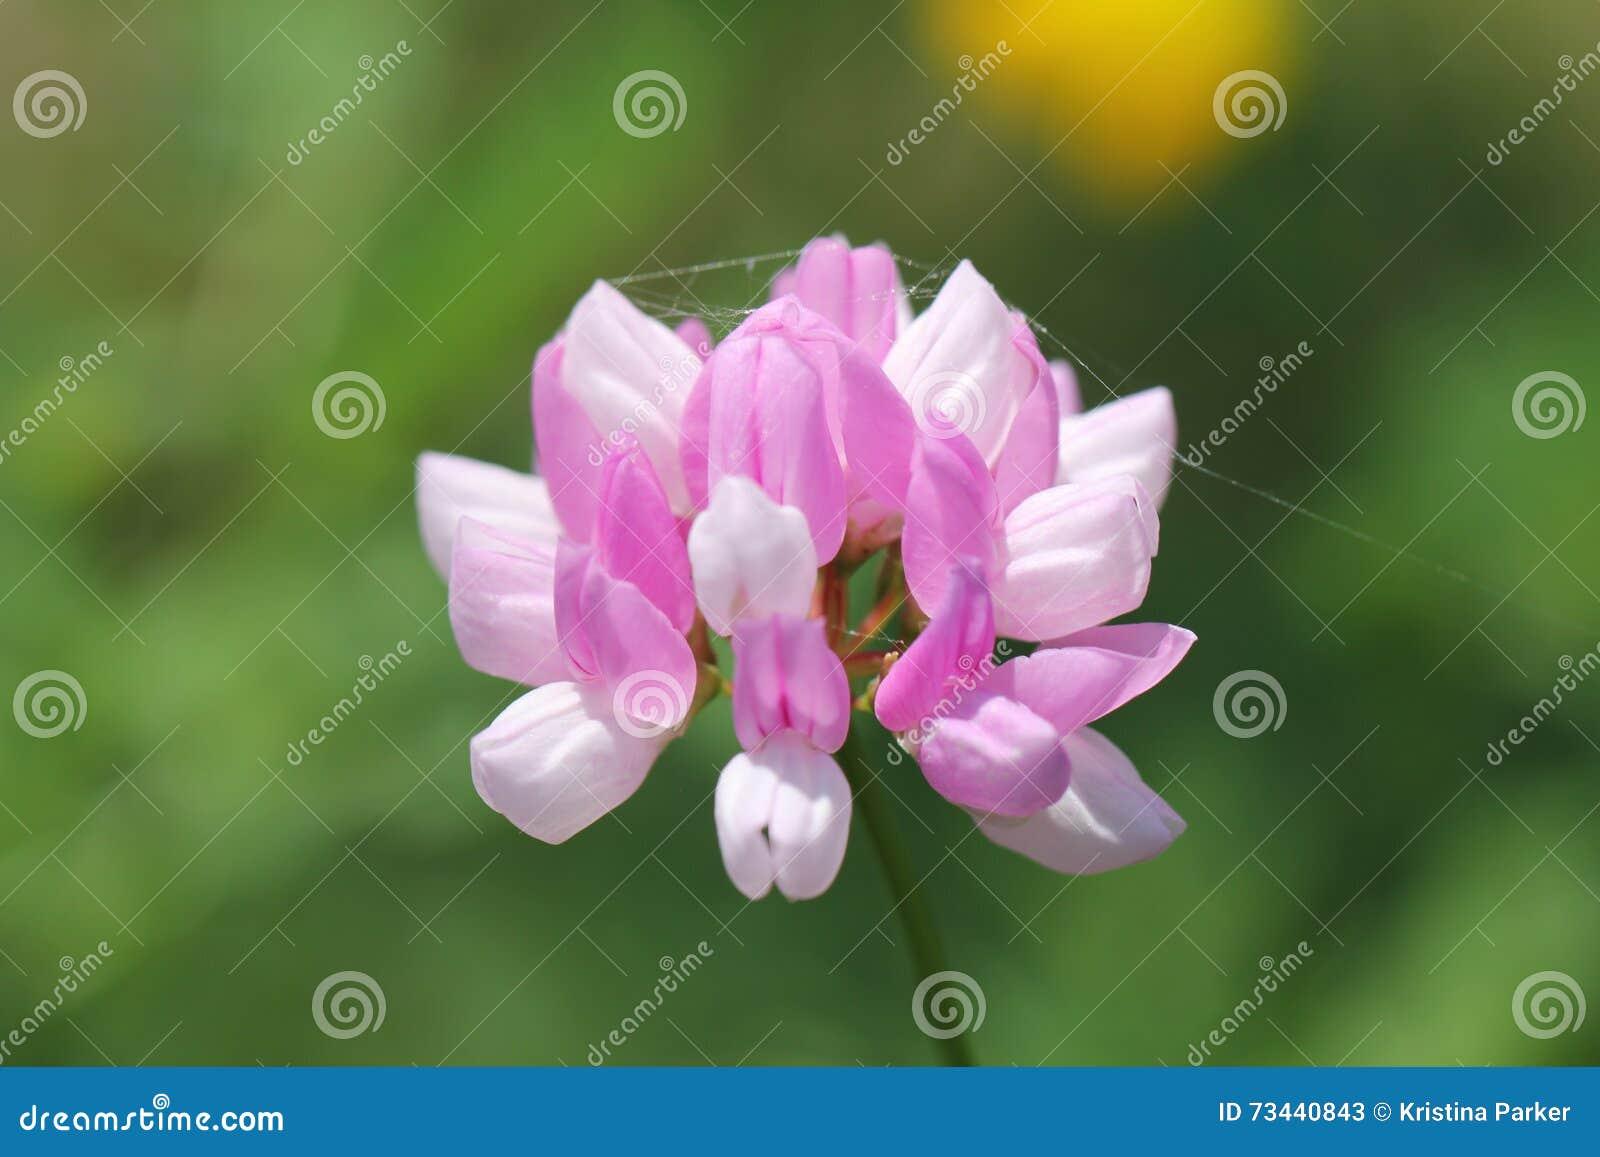 Crown vetch stock image image of full botany crown 73440843 crown vetch izmirmasajfo